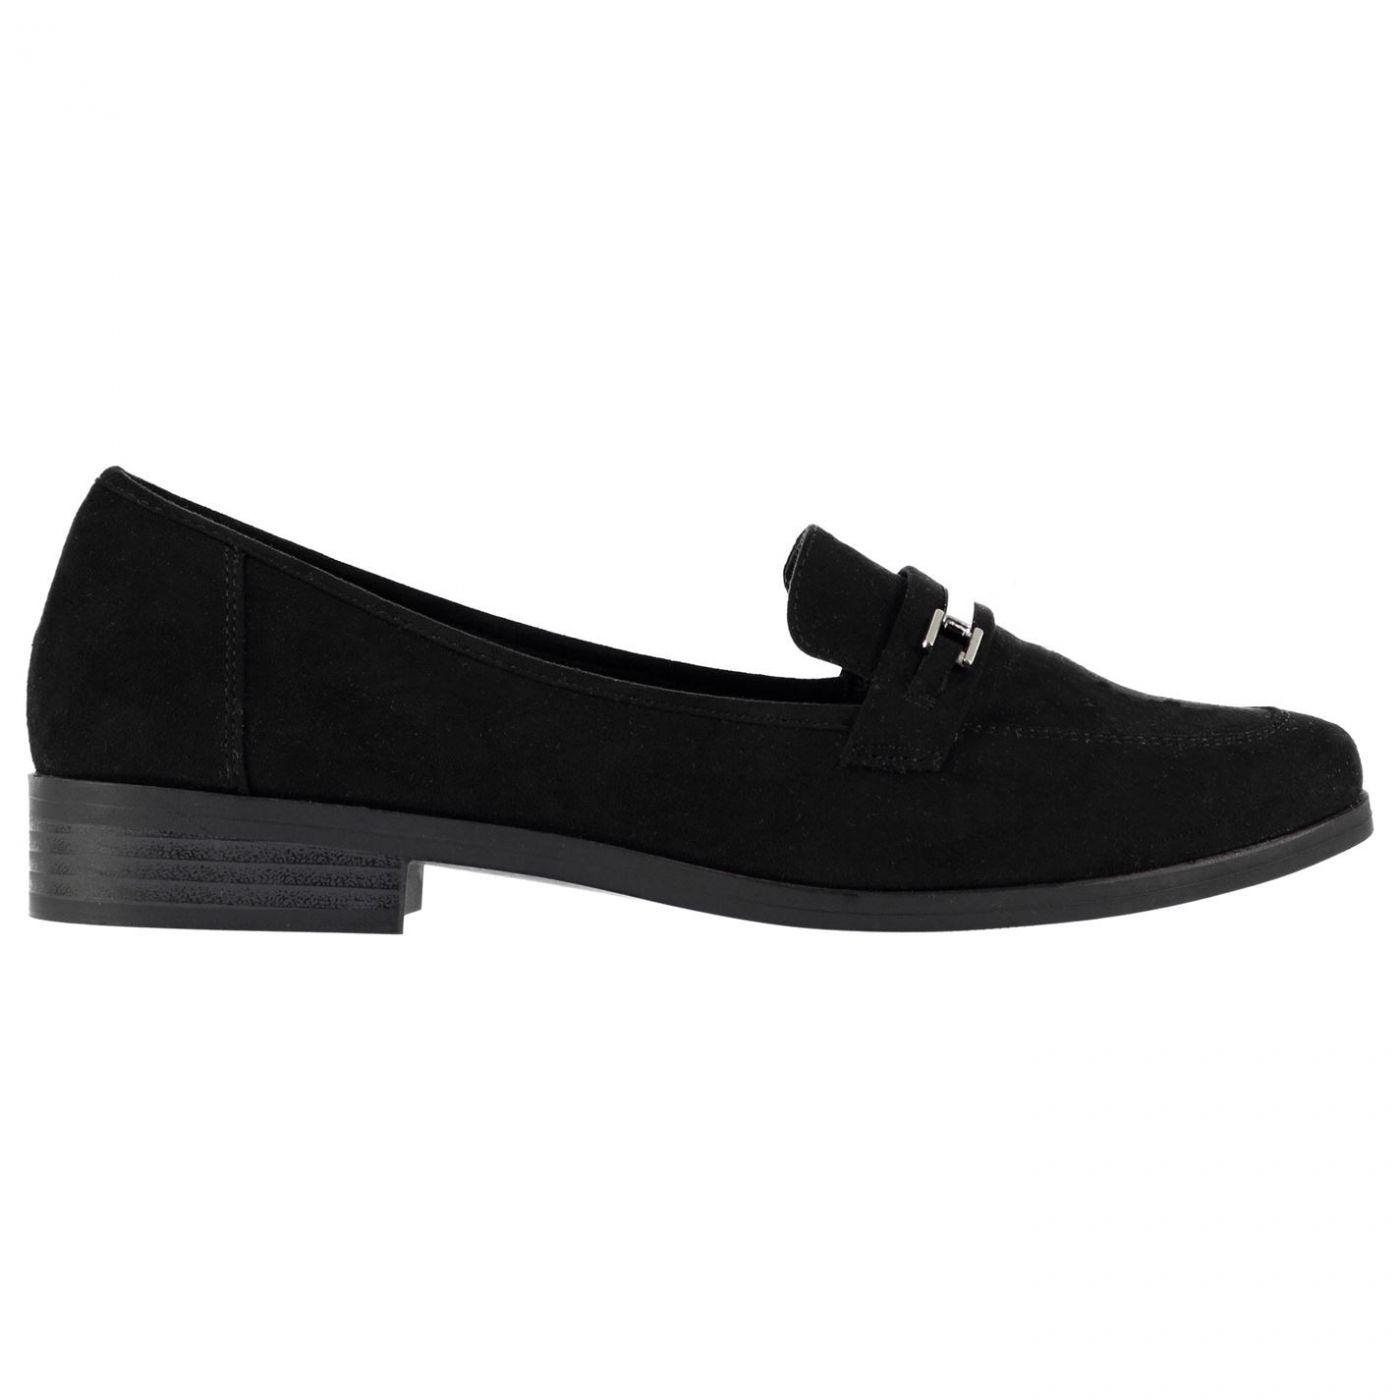 Miso Tasha Bar Shoes Ladies